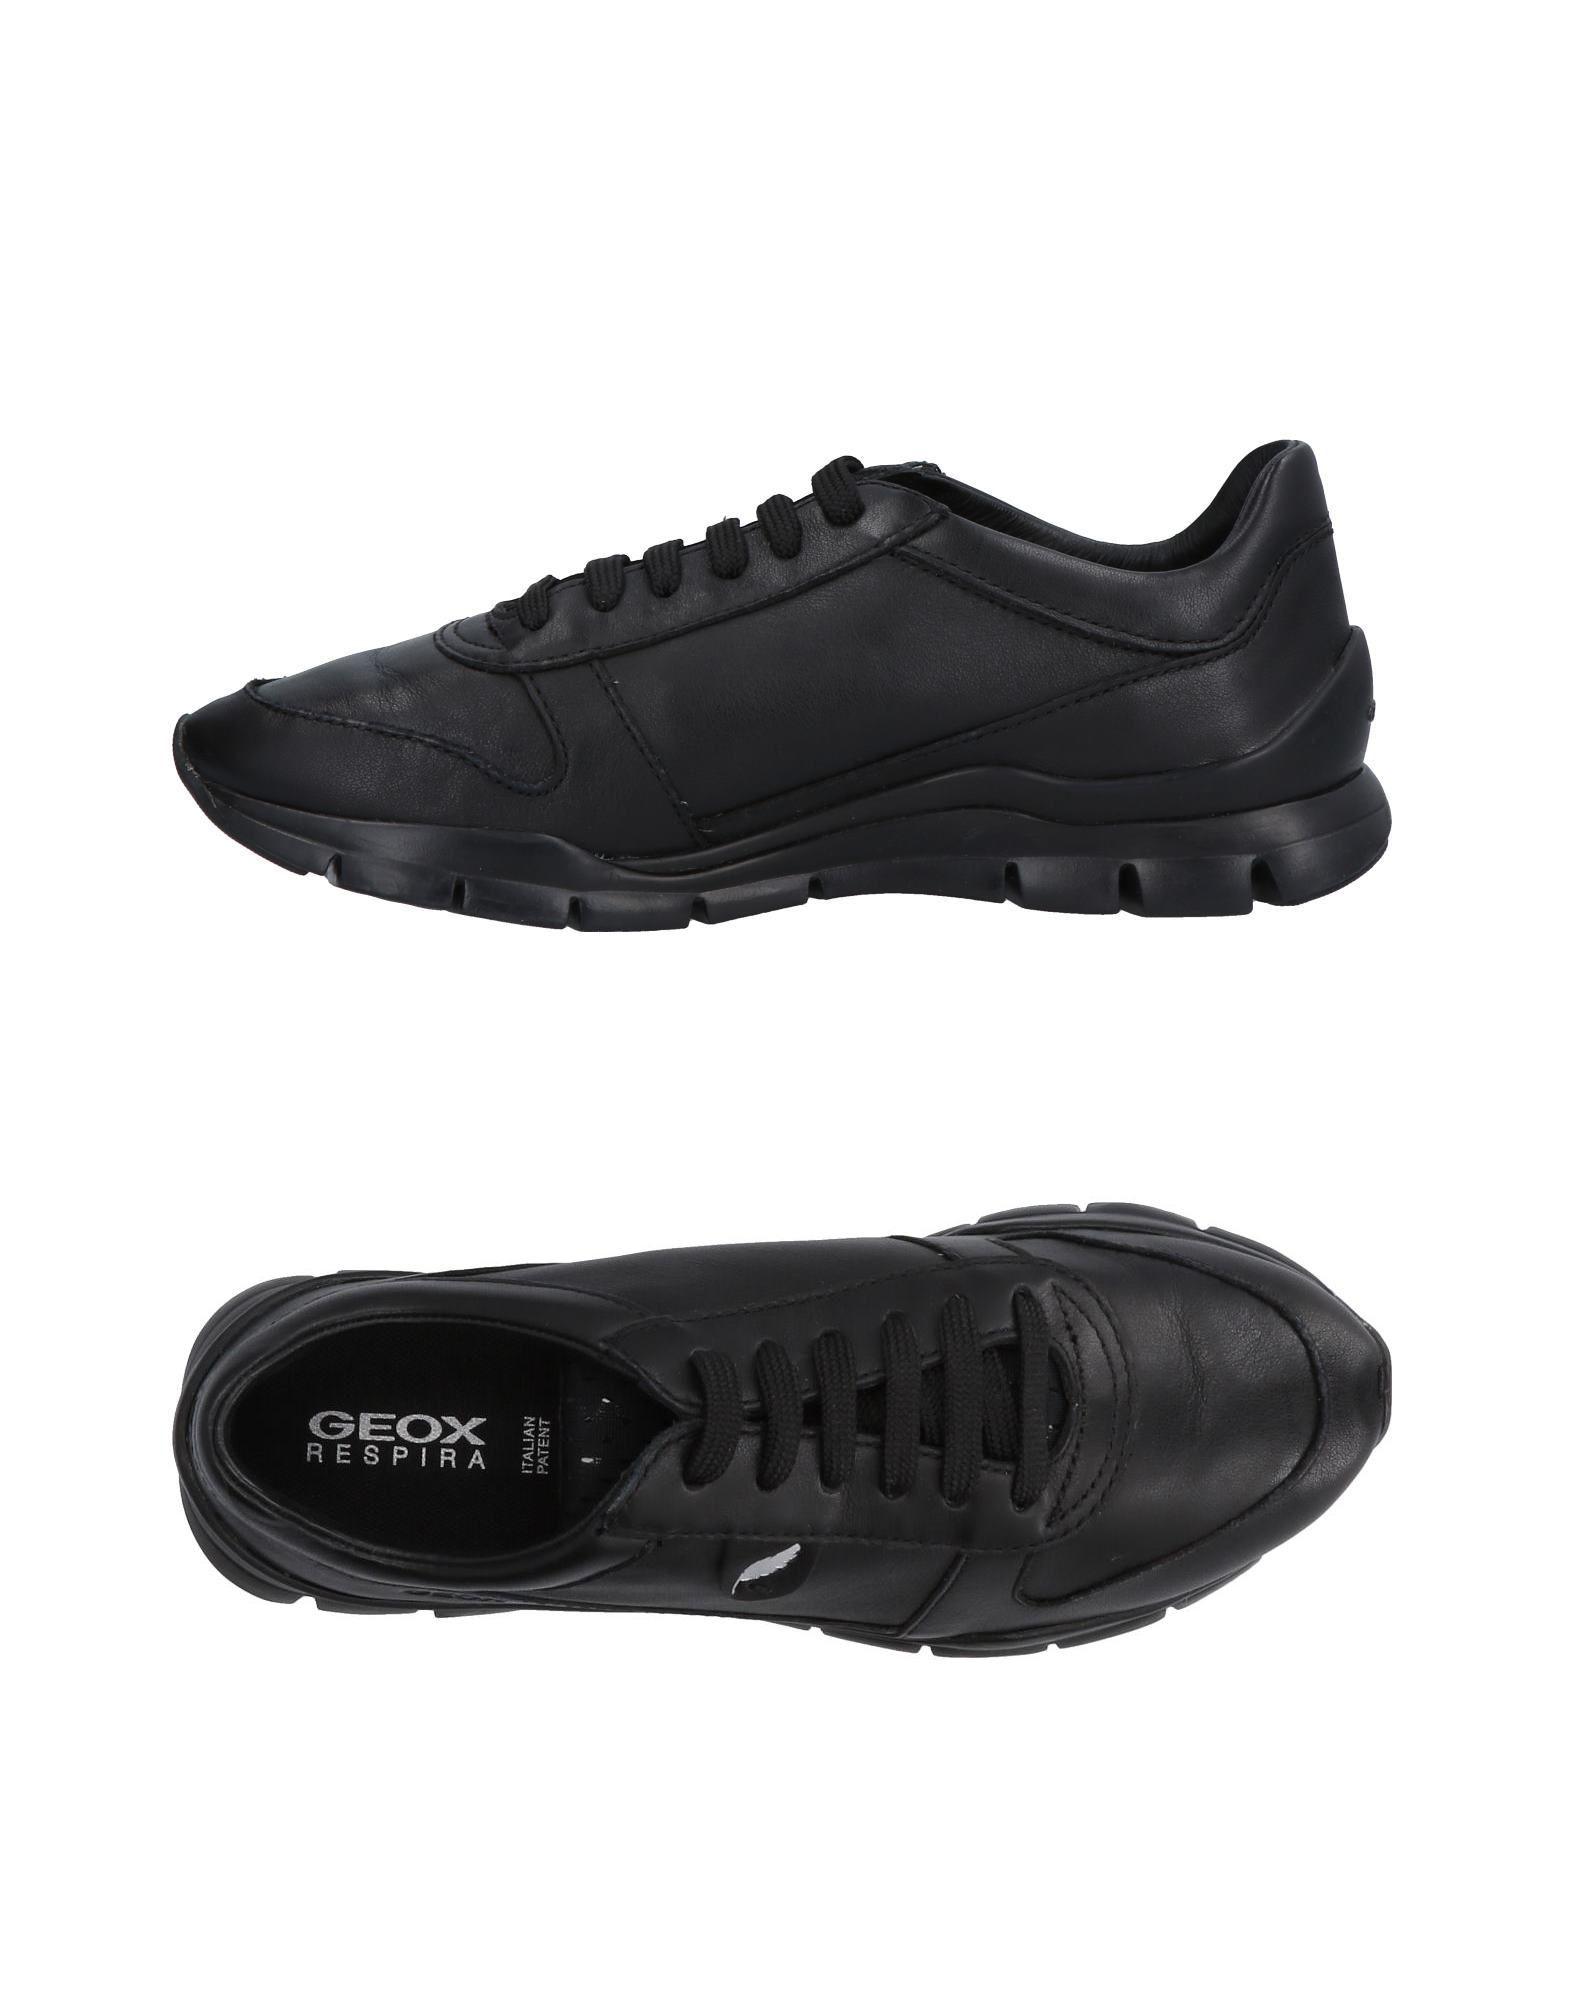 A buon mercato Sneakers Geox Donna - 11489252DR